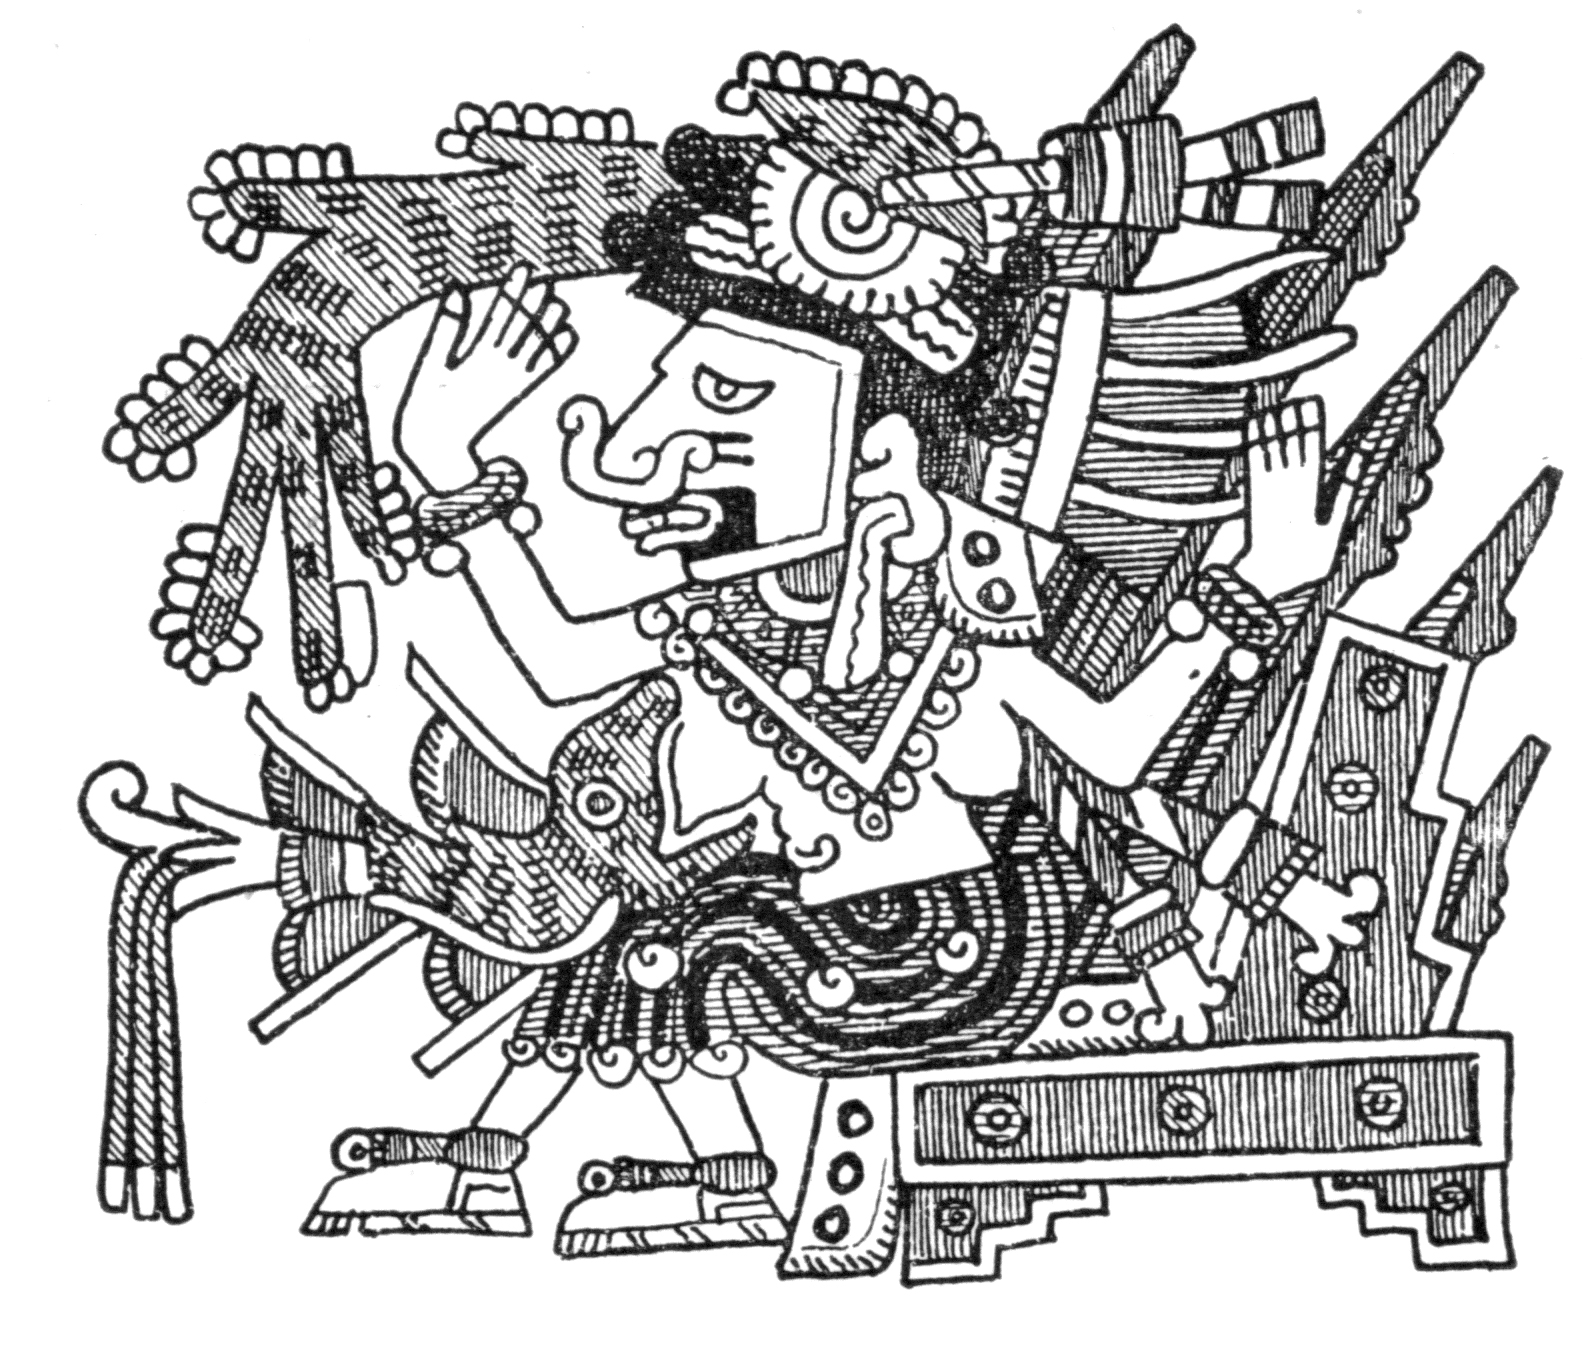 Pulque Tallacua diosa Mayahuel